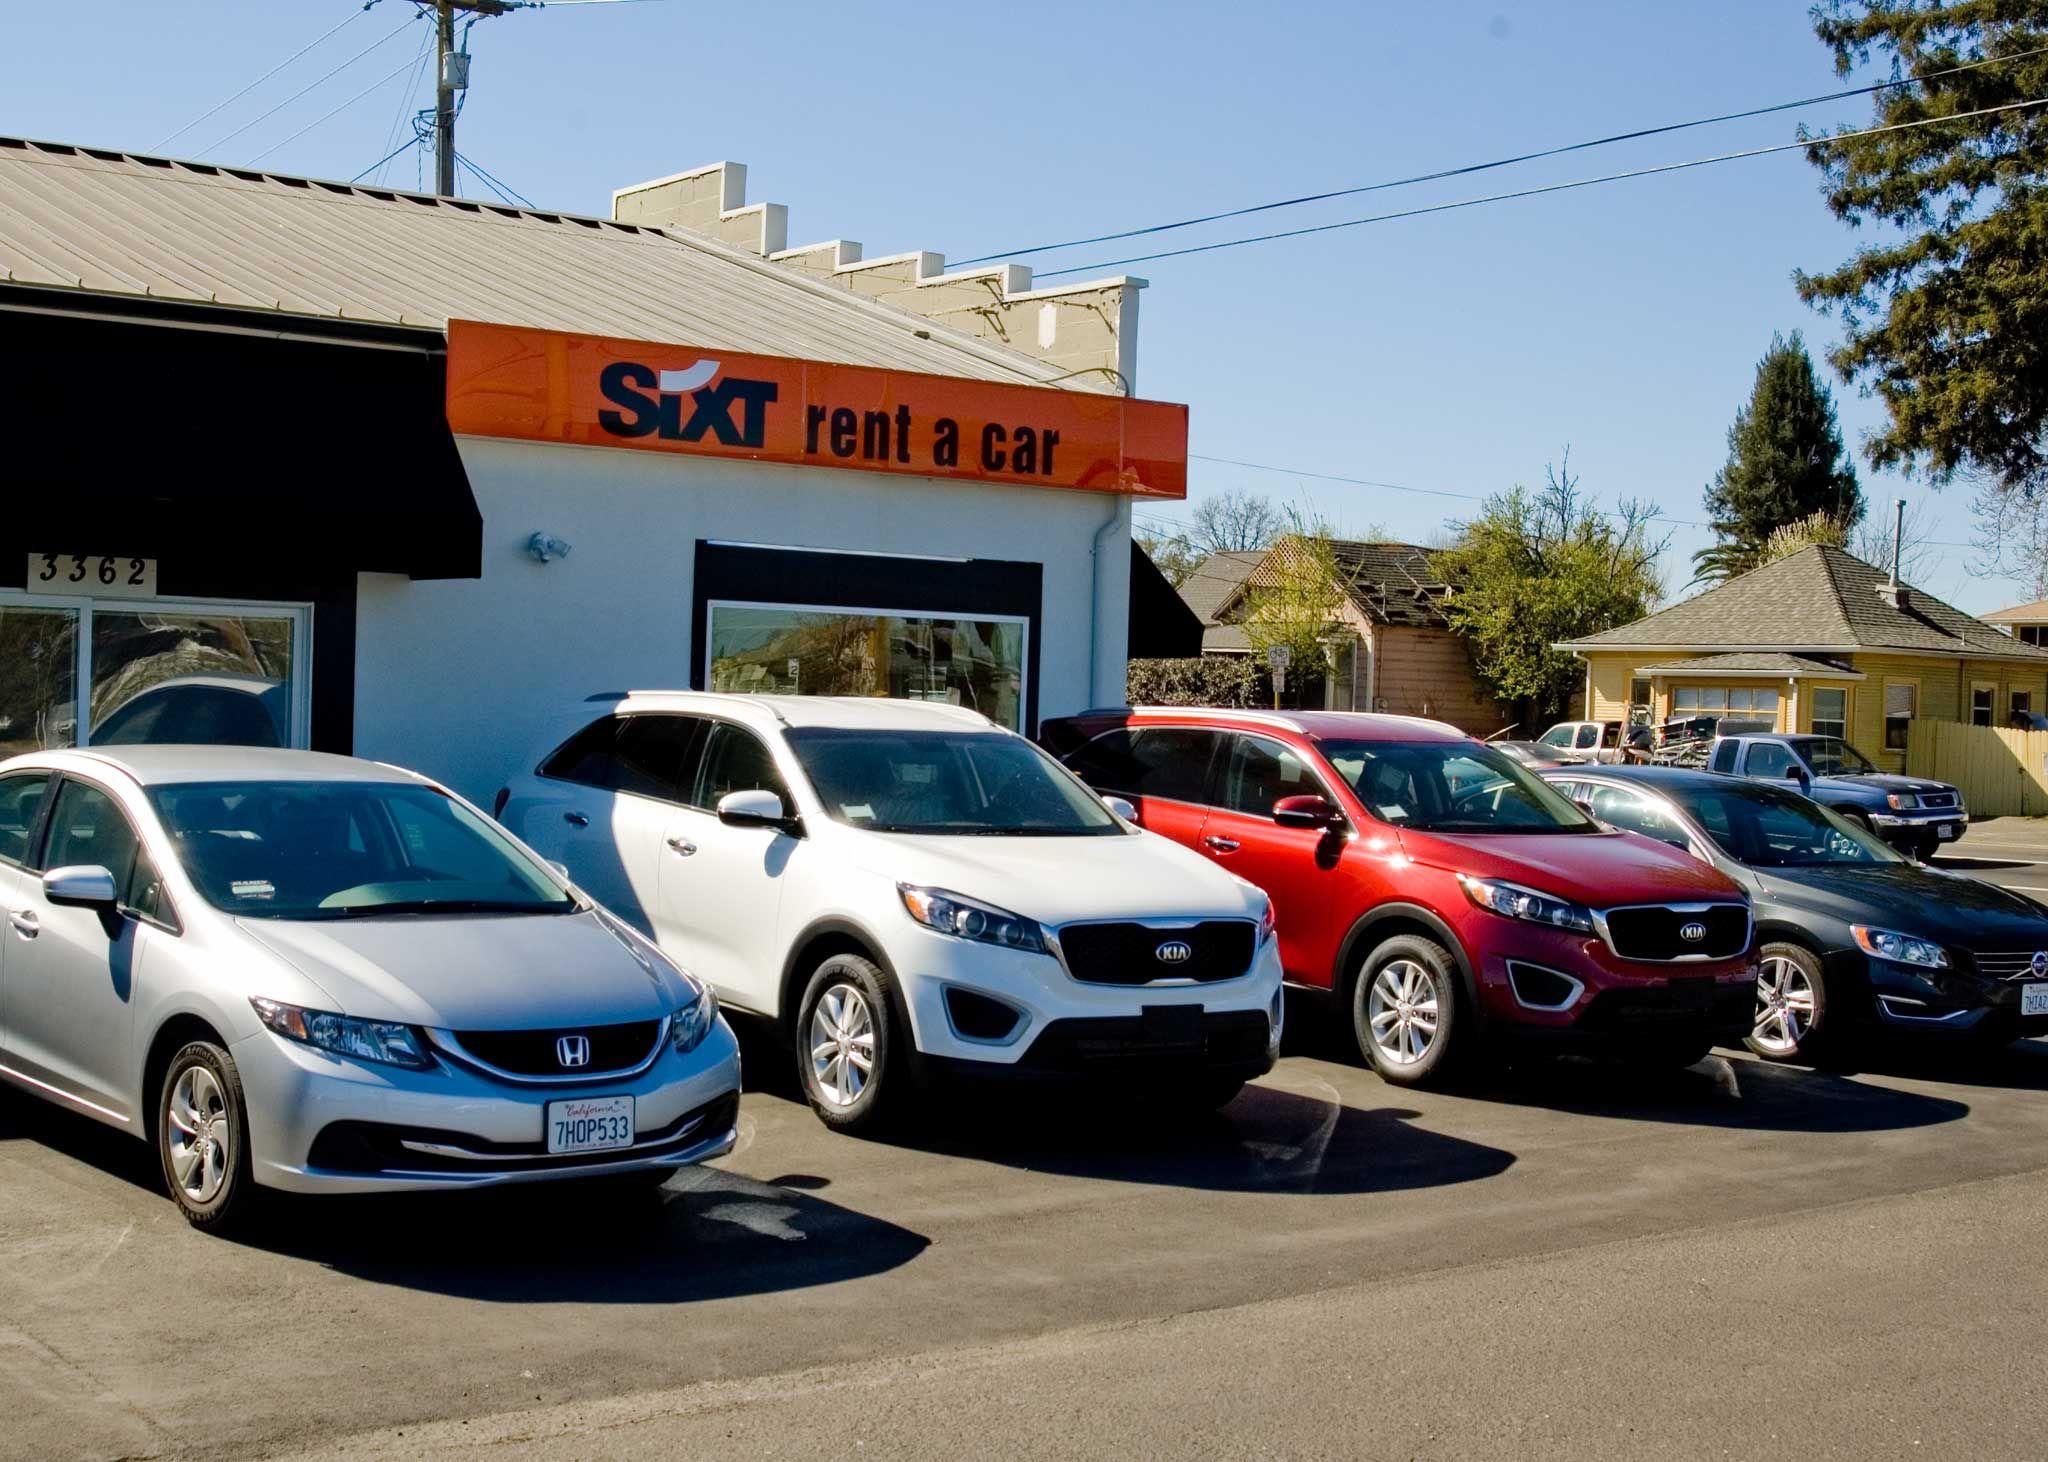 California Rent A Car 6071 Rent A Car Car New Cars For Sale